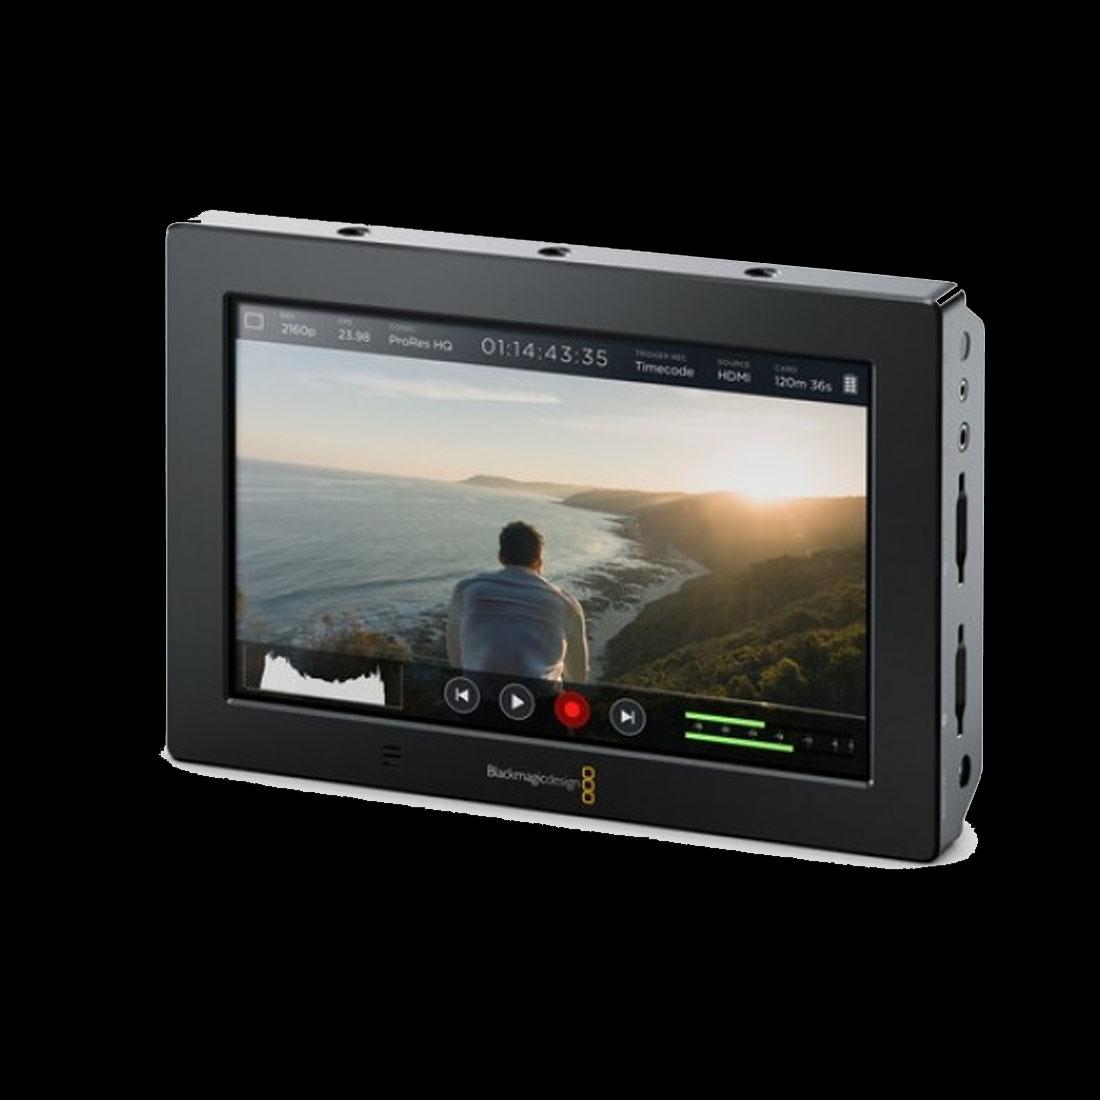 BLACKMAGIC DESIGN VIDEO ASSIST 4K 7 HDMI6G-SDI RECORDING MONITOR